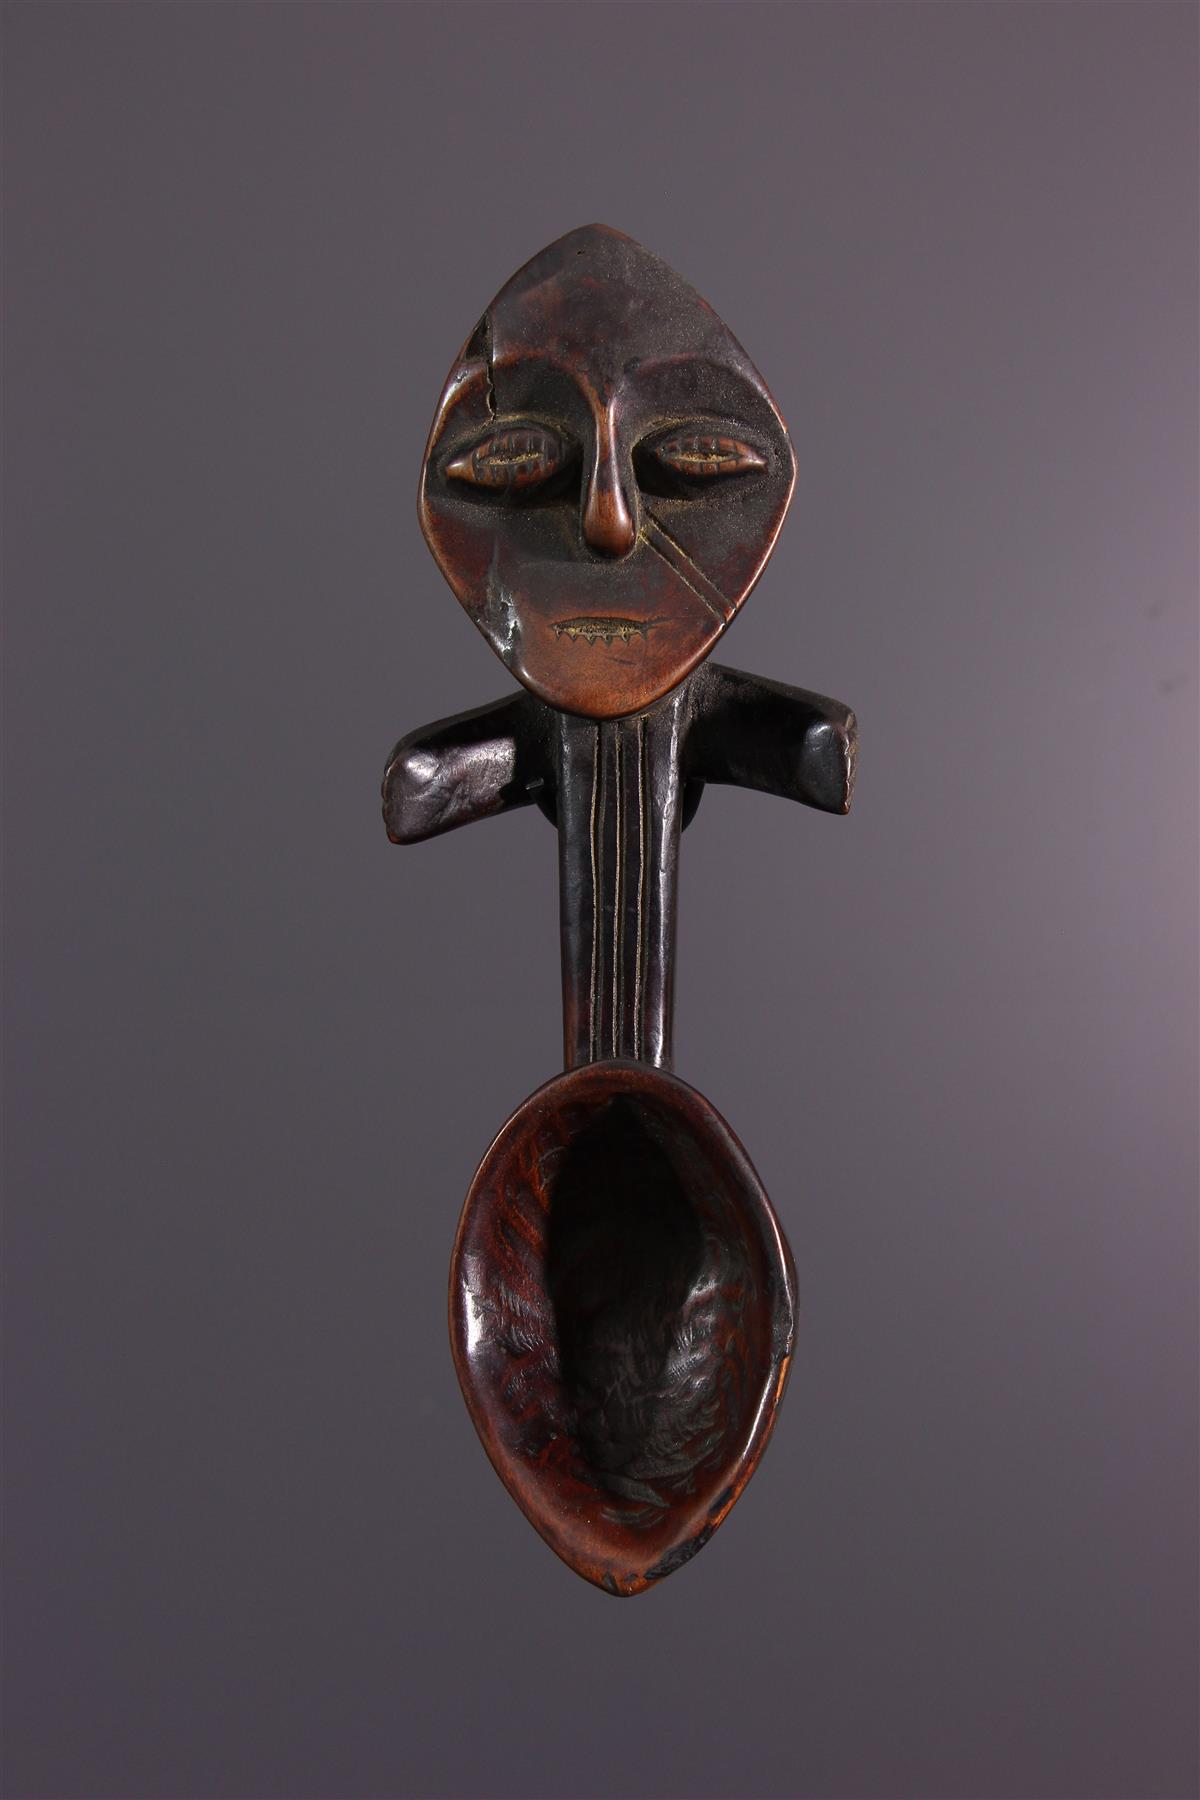 Lega Spoon - African art